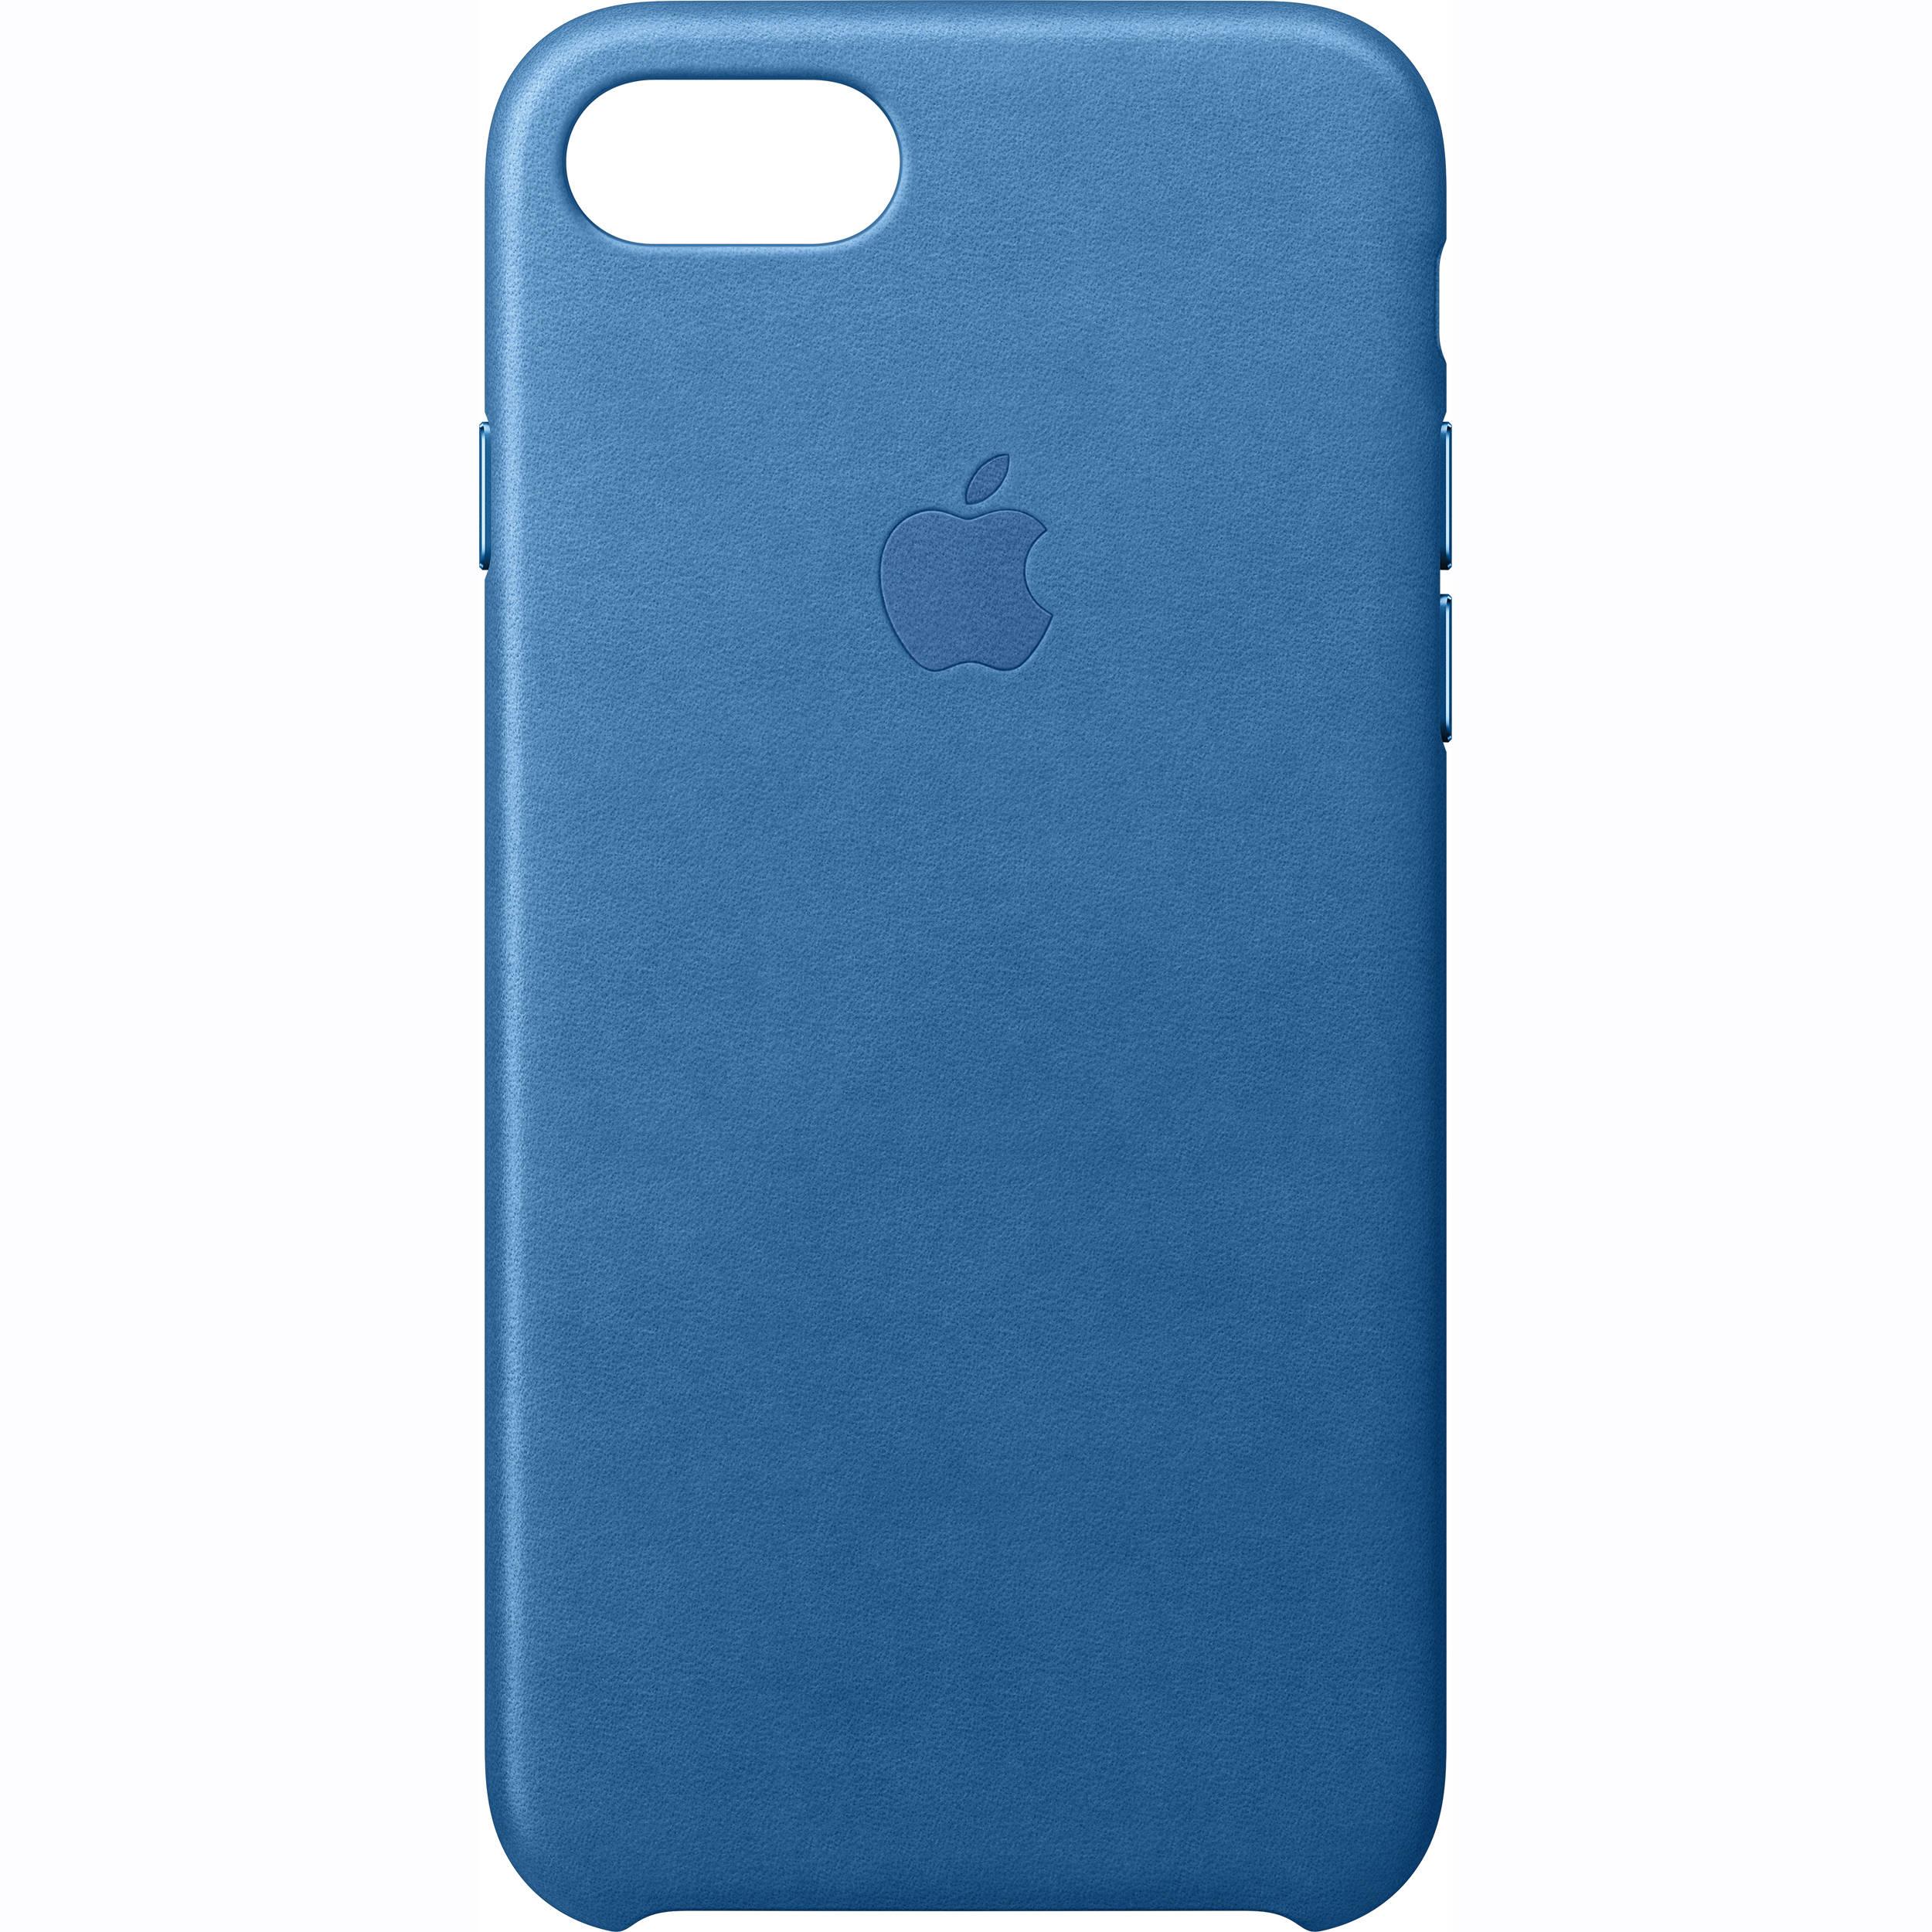 Beige Iphone Case